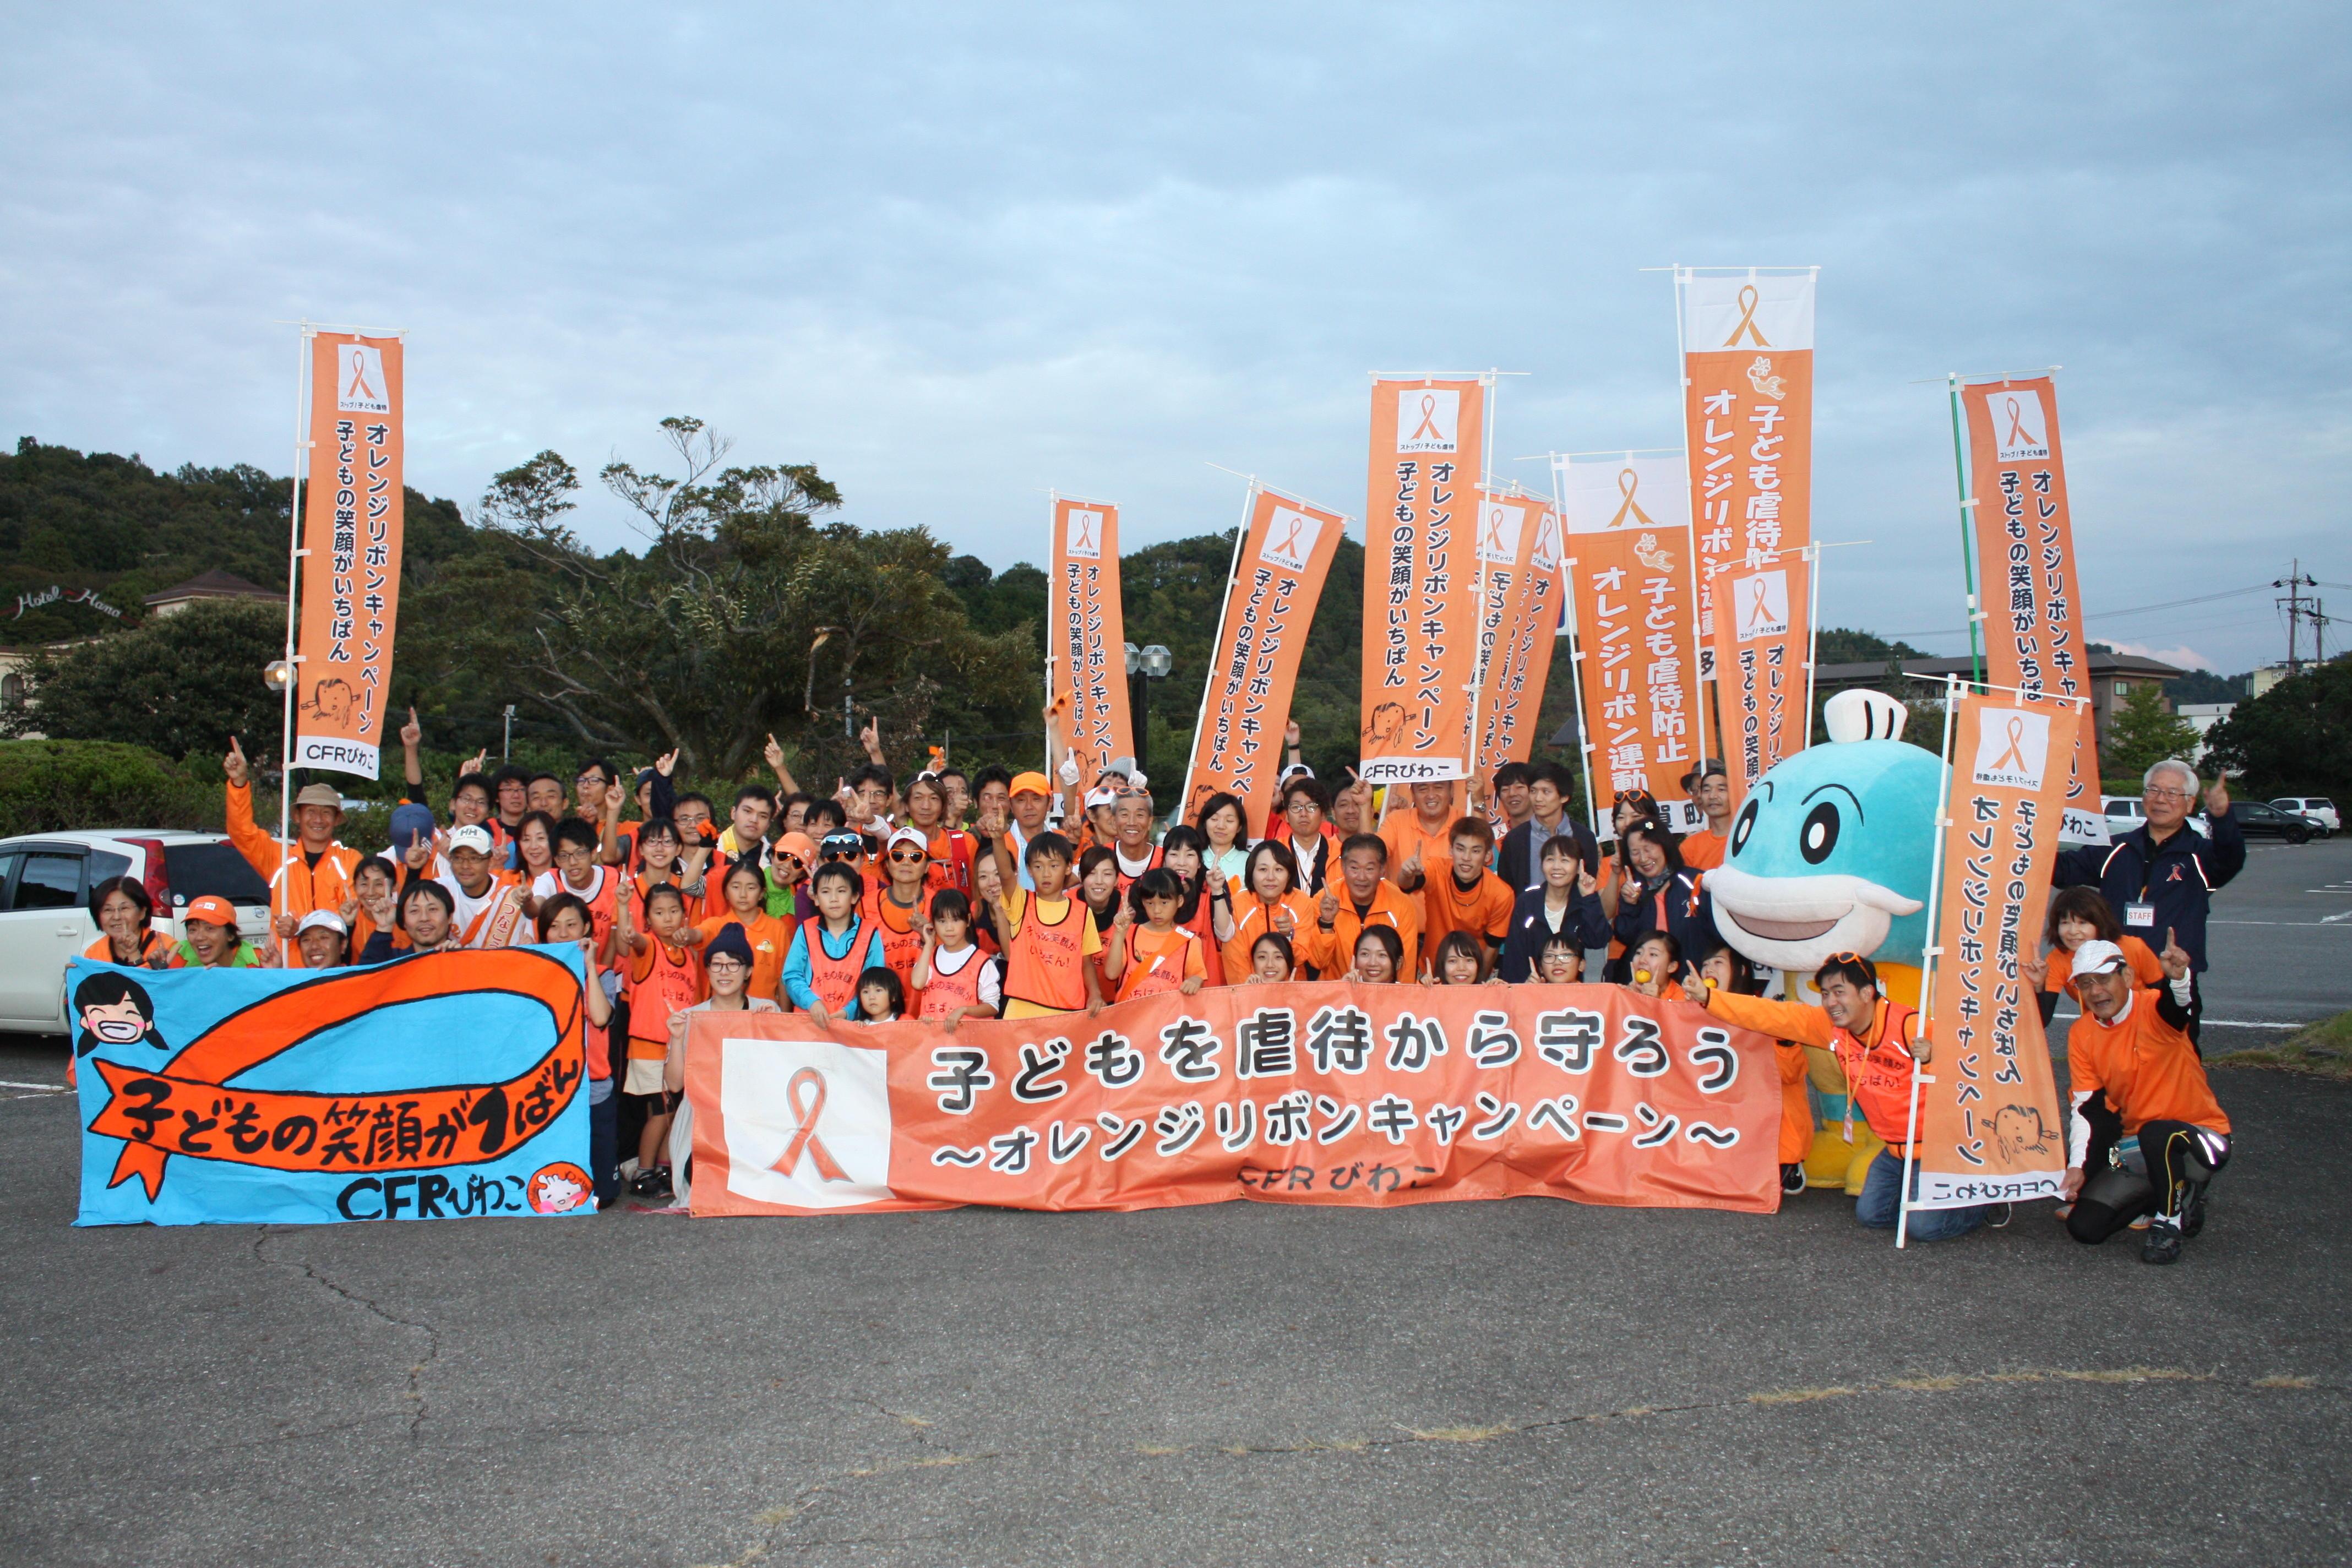 http://www.orangeribbon.jp/info/organization/IMG_2684.JPG